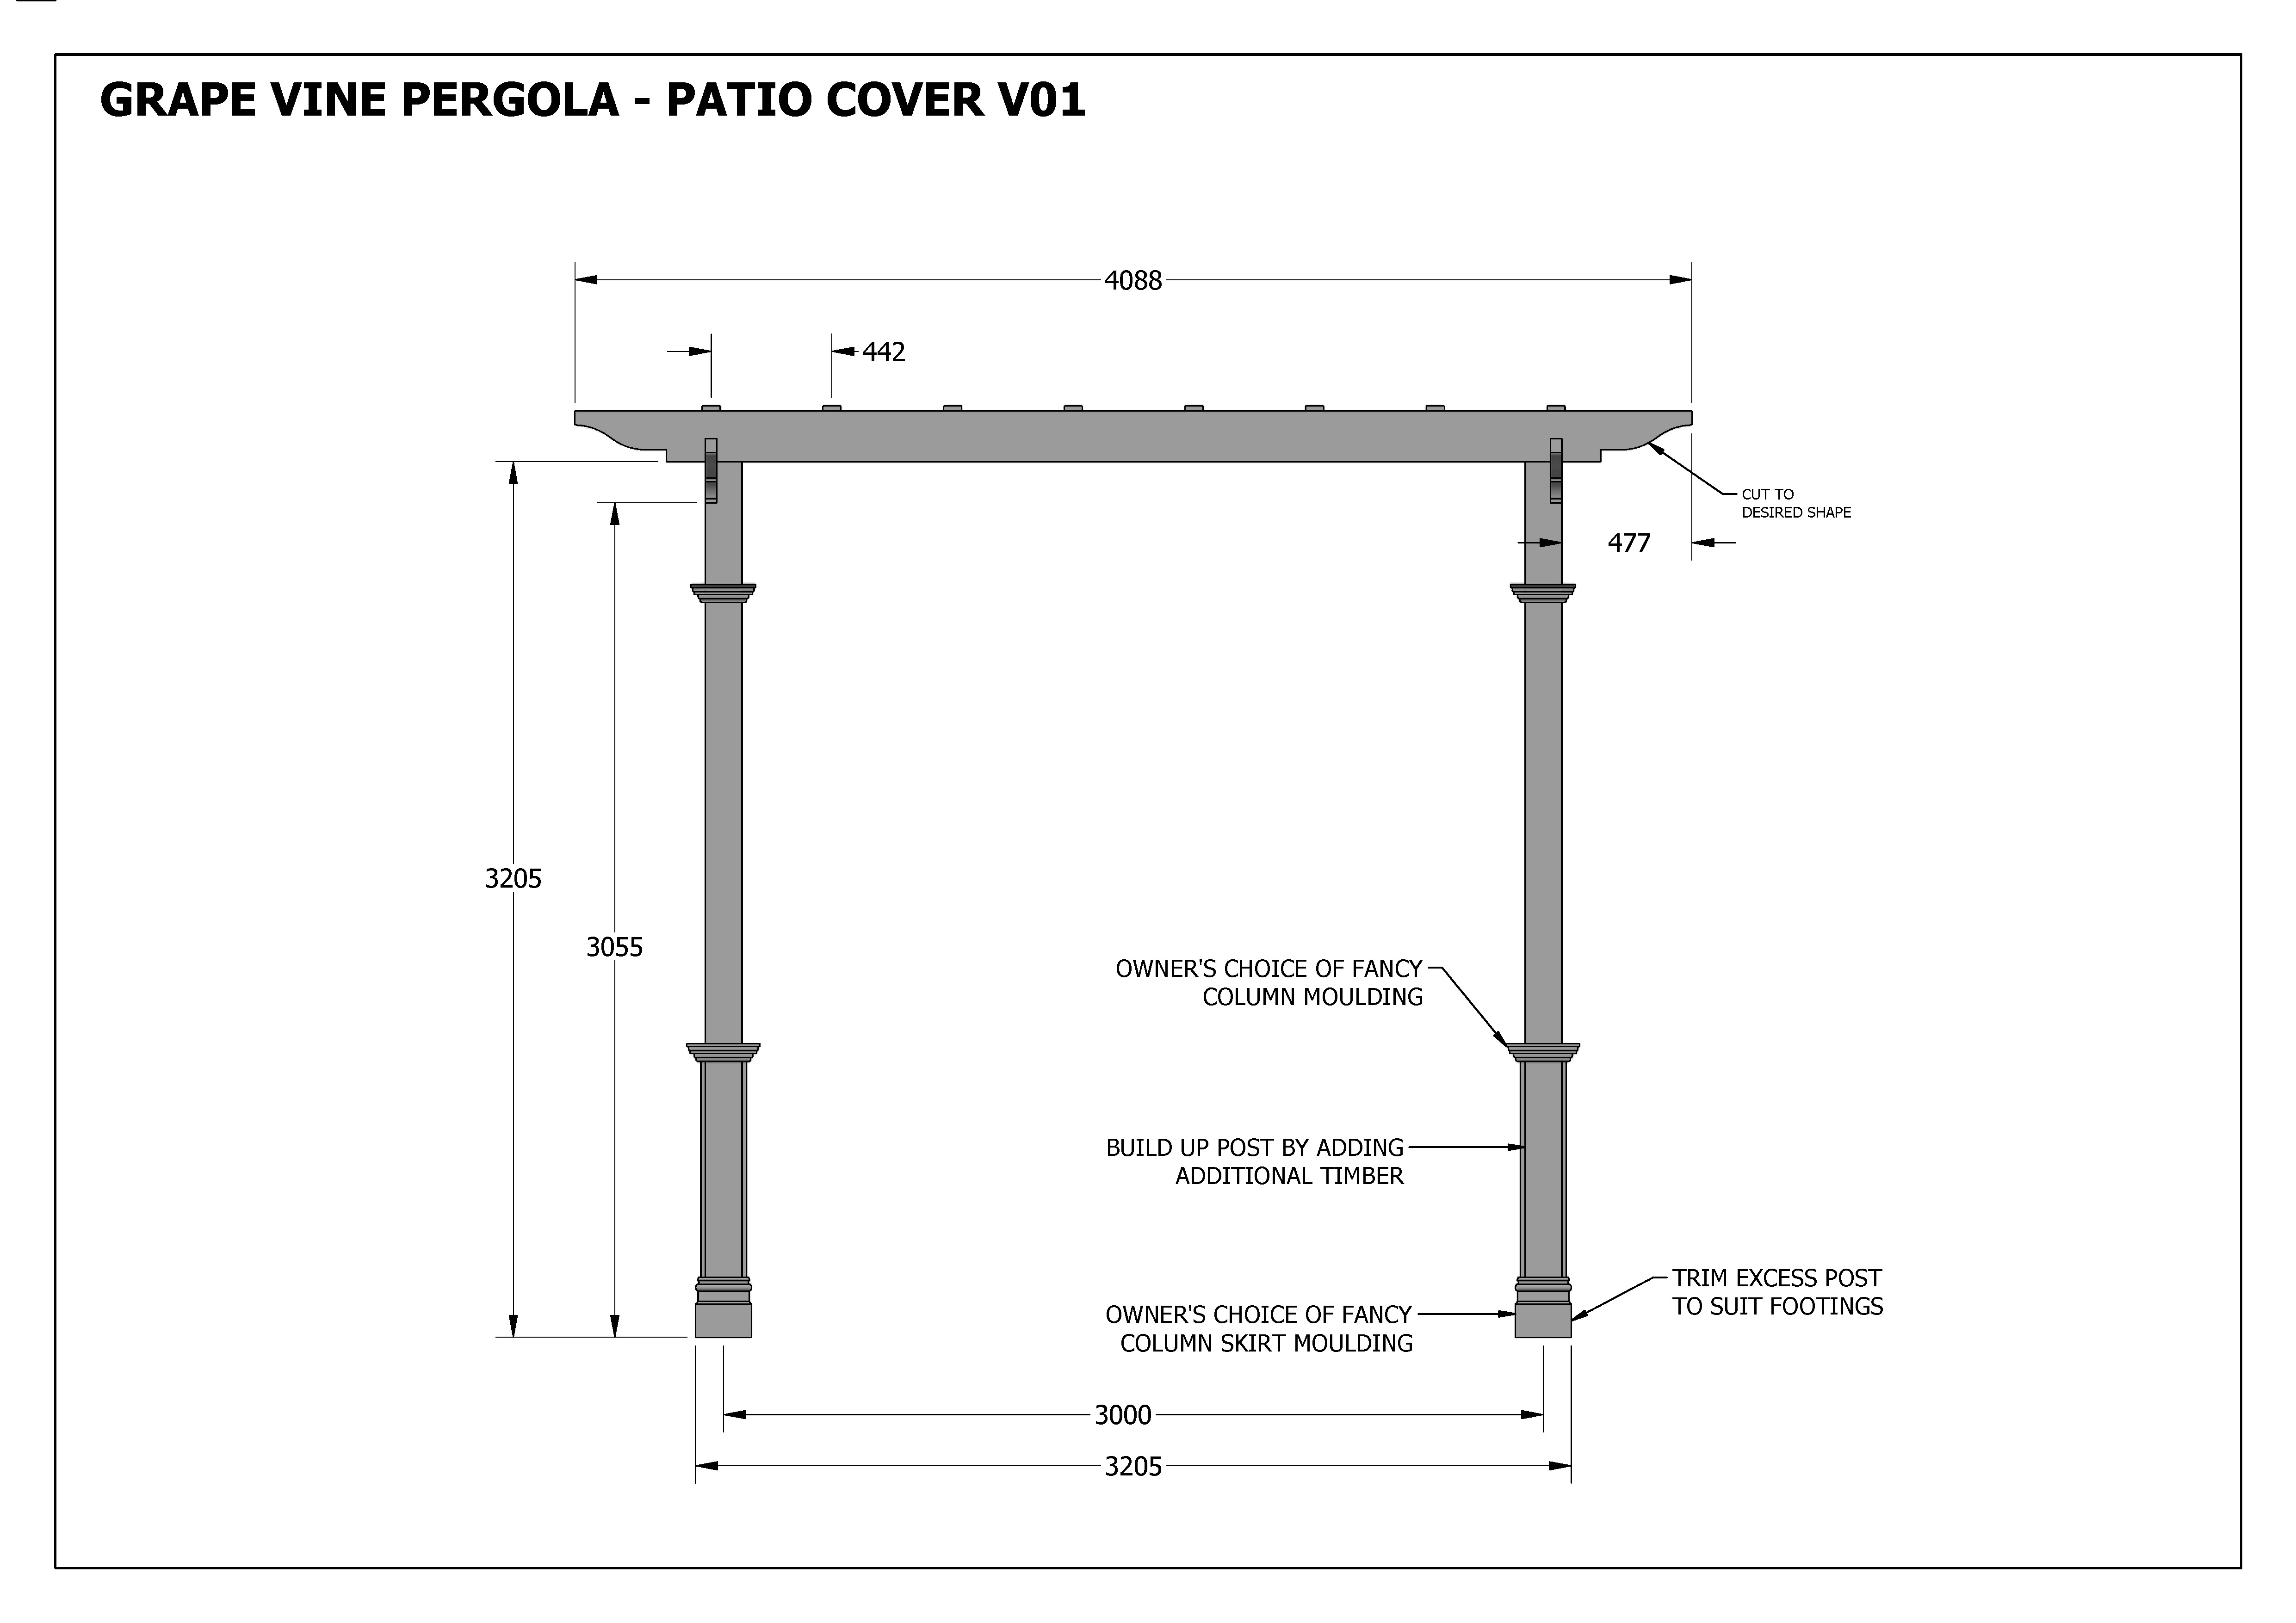 GRAPE VINE PERGOLA - OUTDOOR PATIO COVER V1 - Full ... on Patio Cover Decorating Ideas id=82482